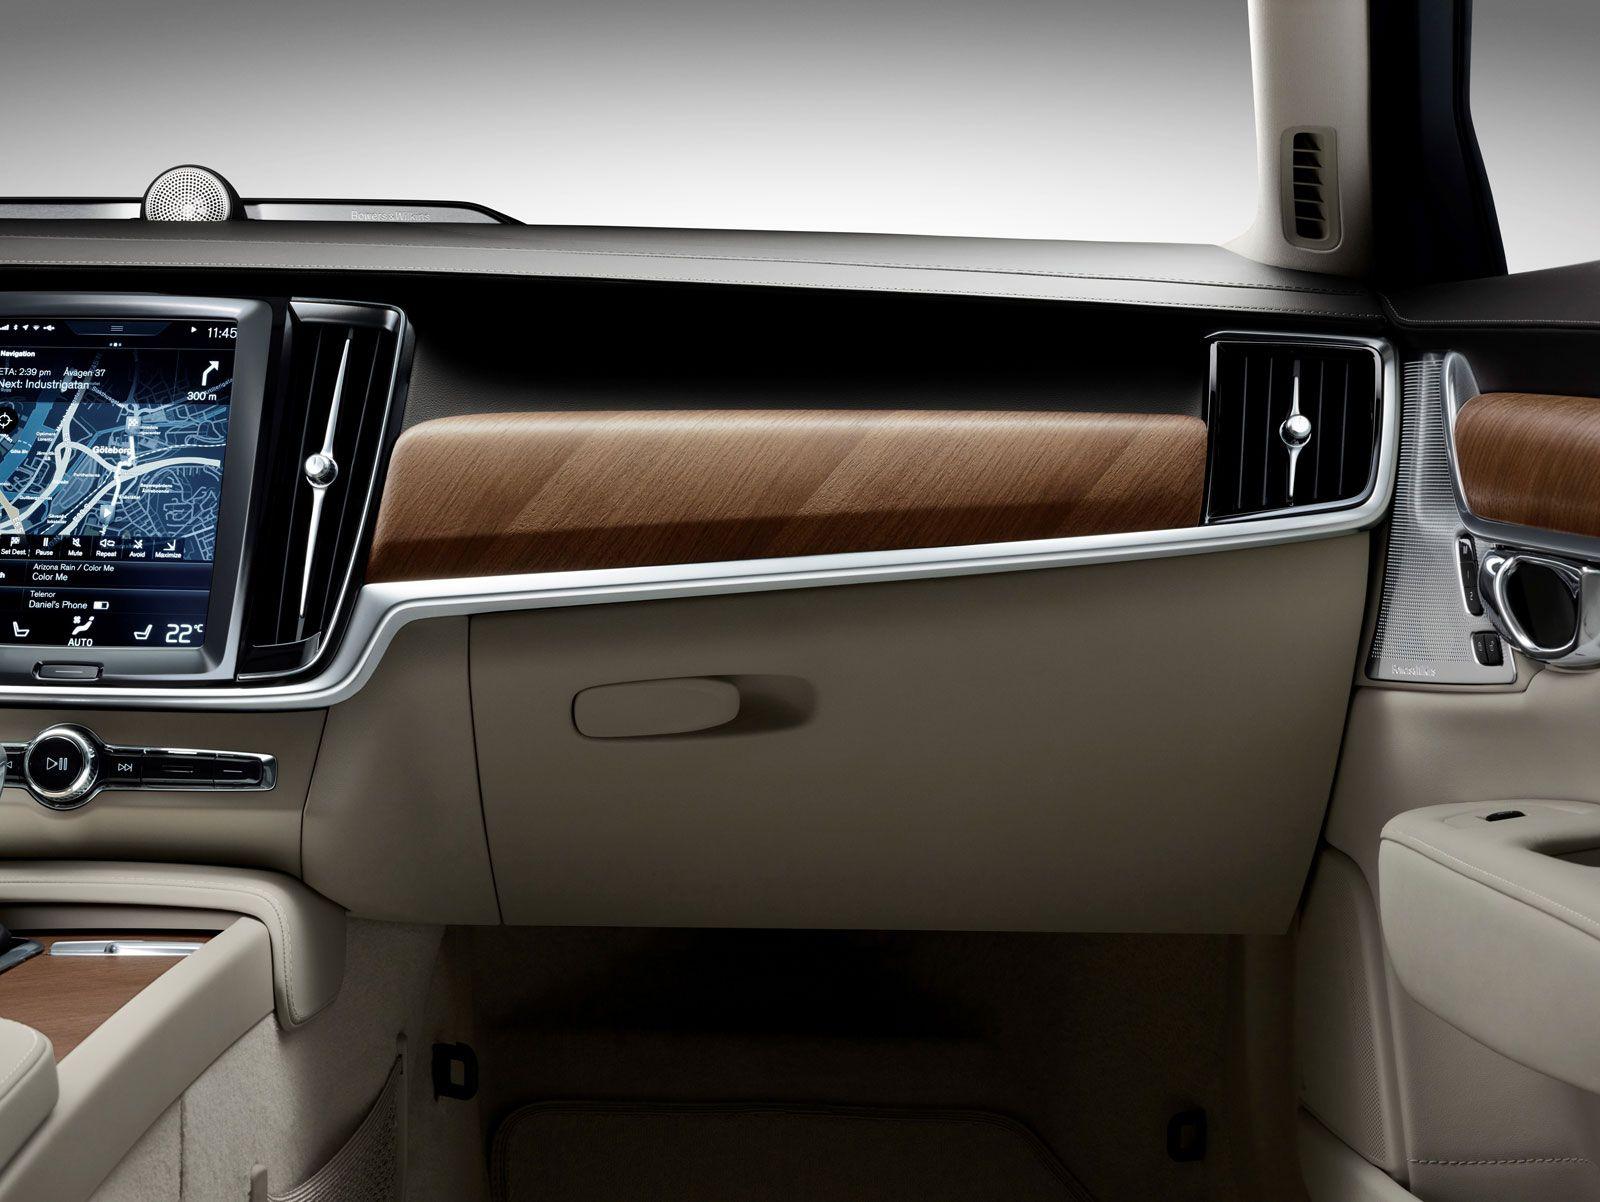 Volvo S90 Interior - IP and glove box | car interior ...